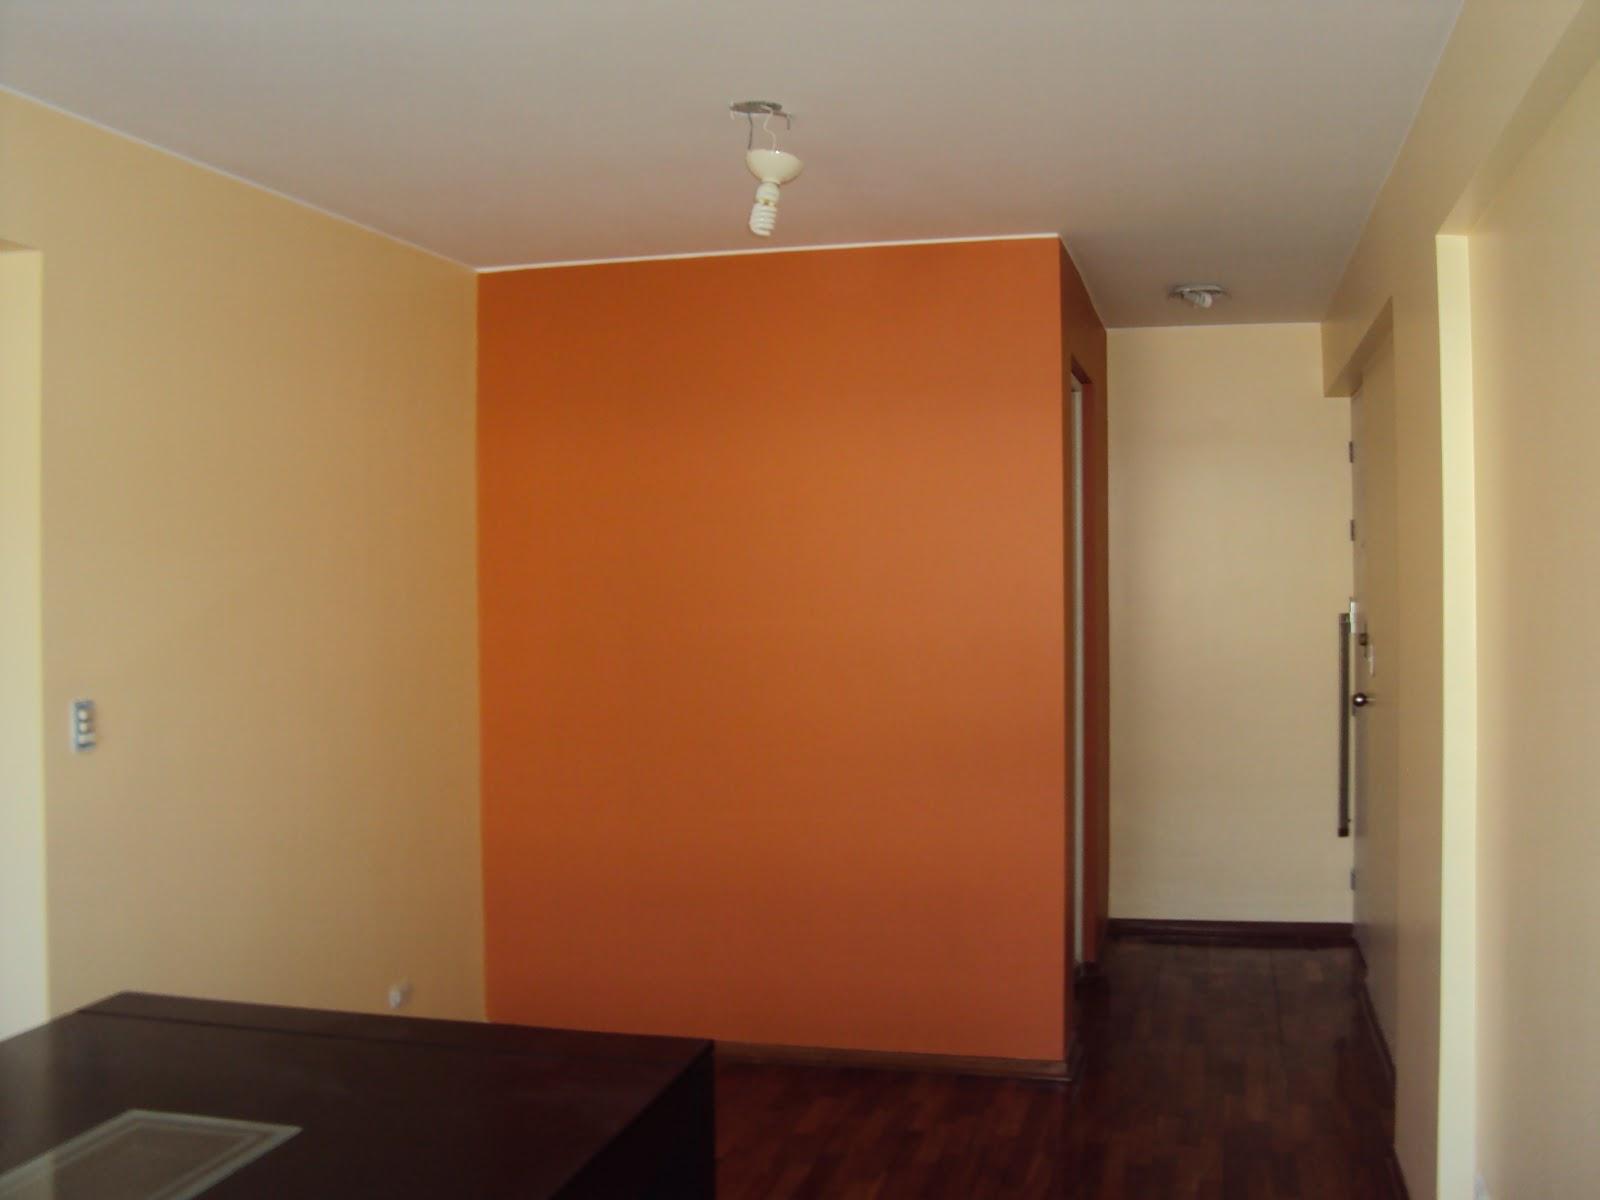 Pintandoelperu departamento empastado con pasta de muros - Pintura de pizarra para paredes ...